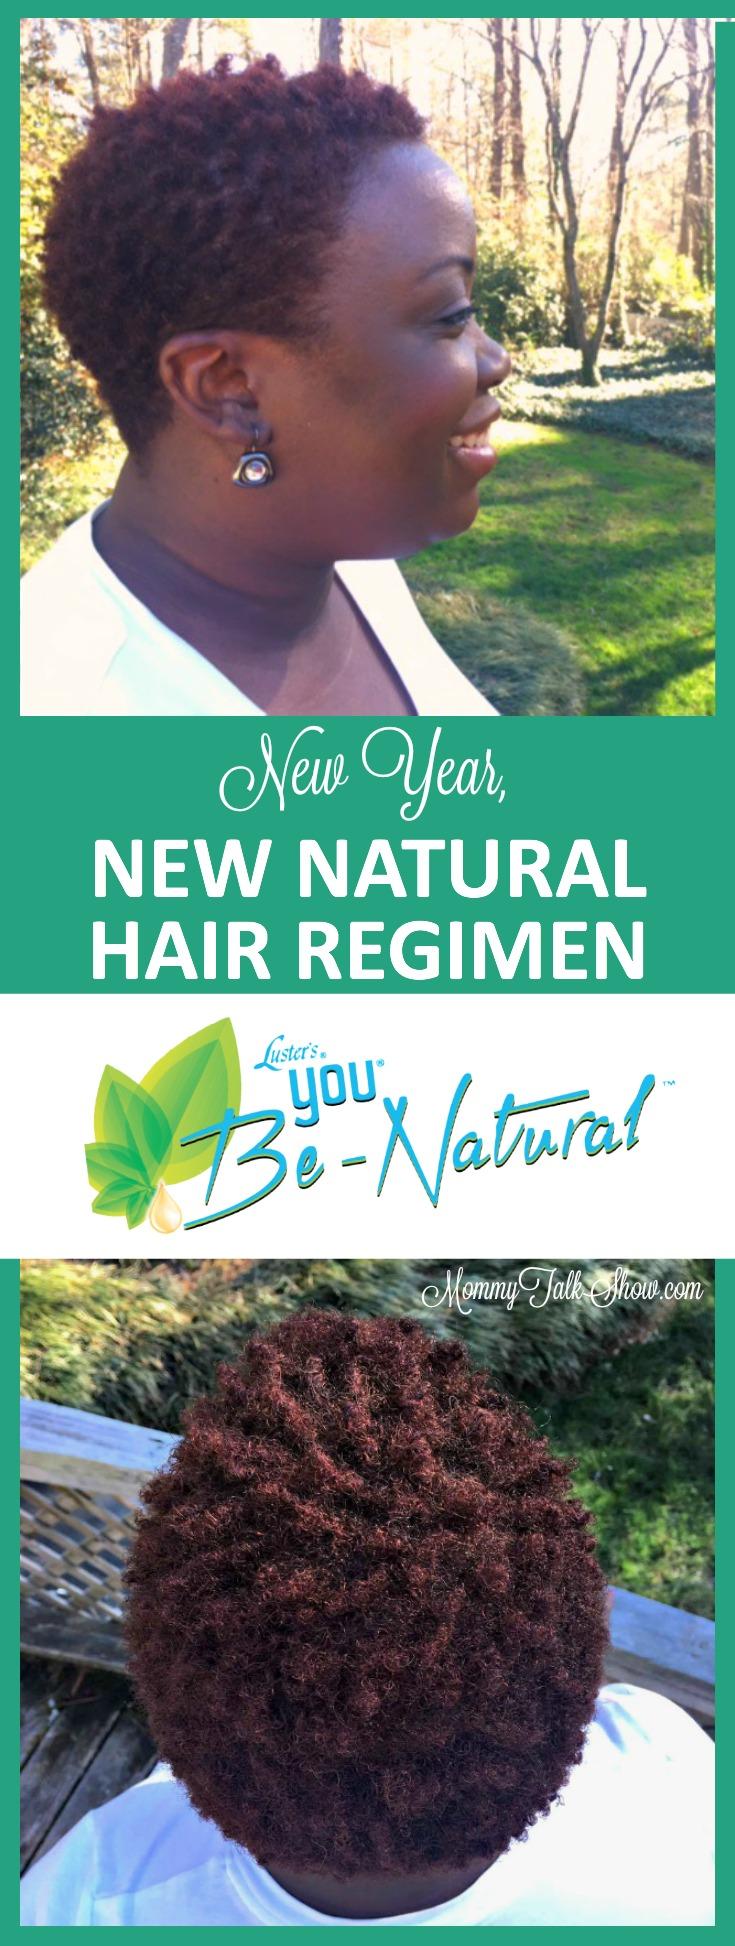 Natural Hair Regimen